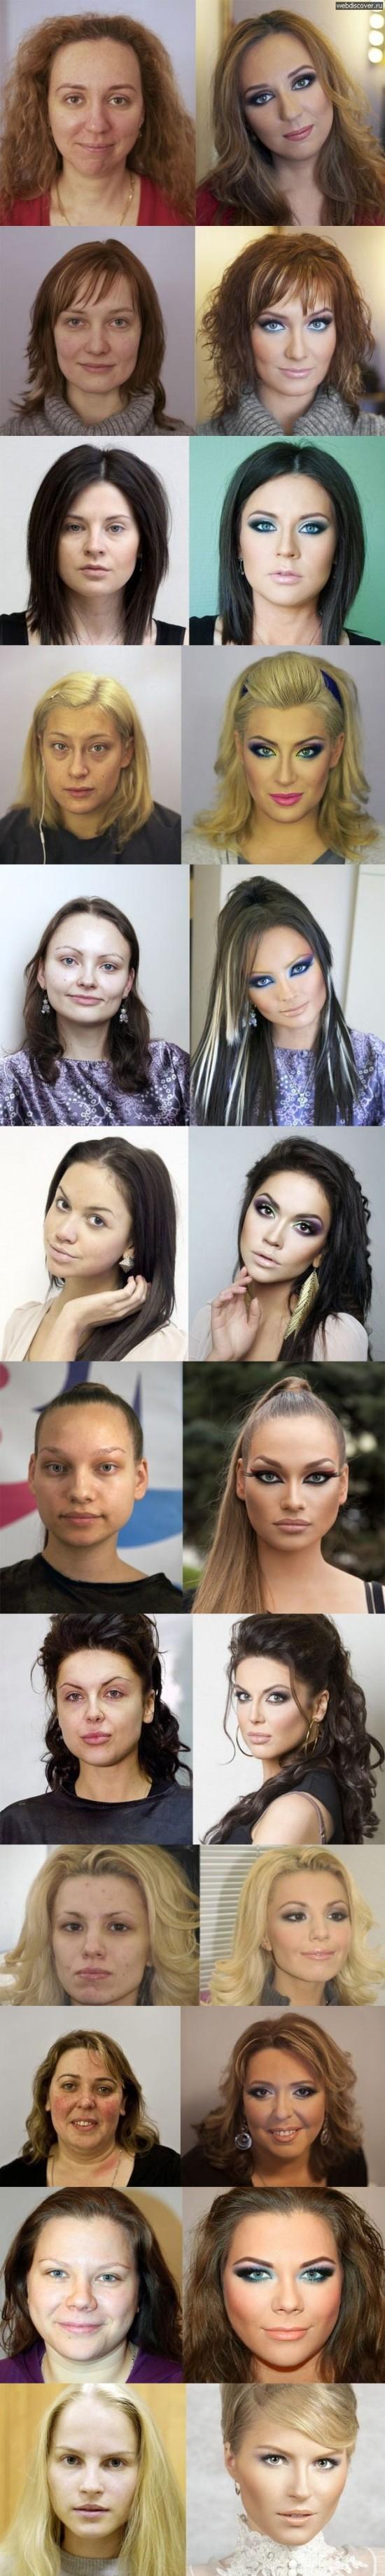 Viva el maquillaje